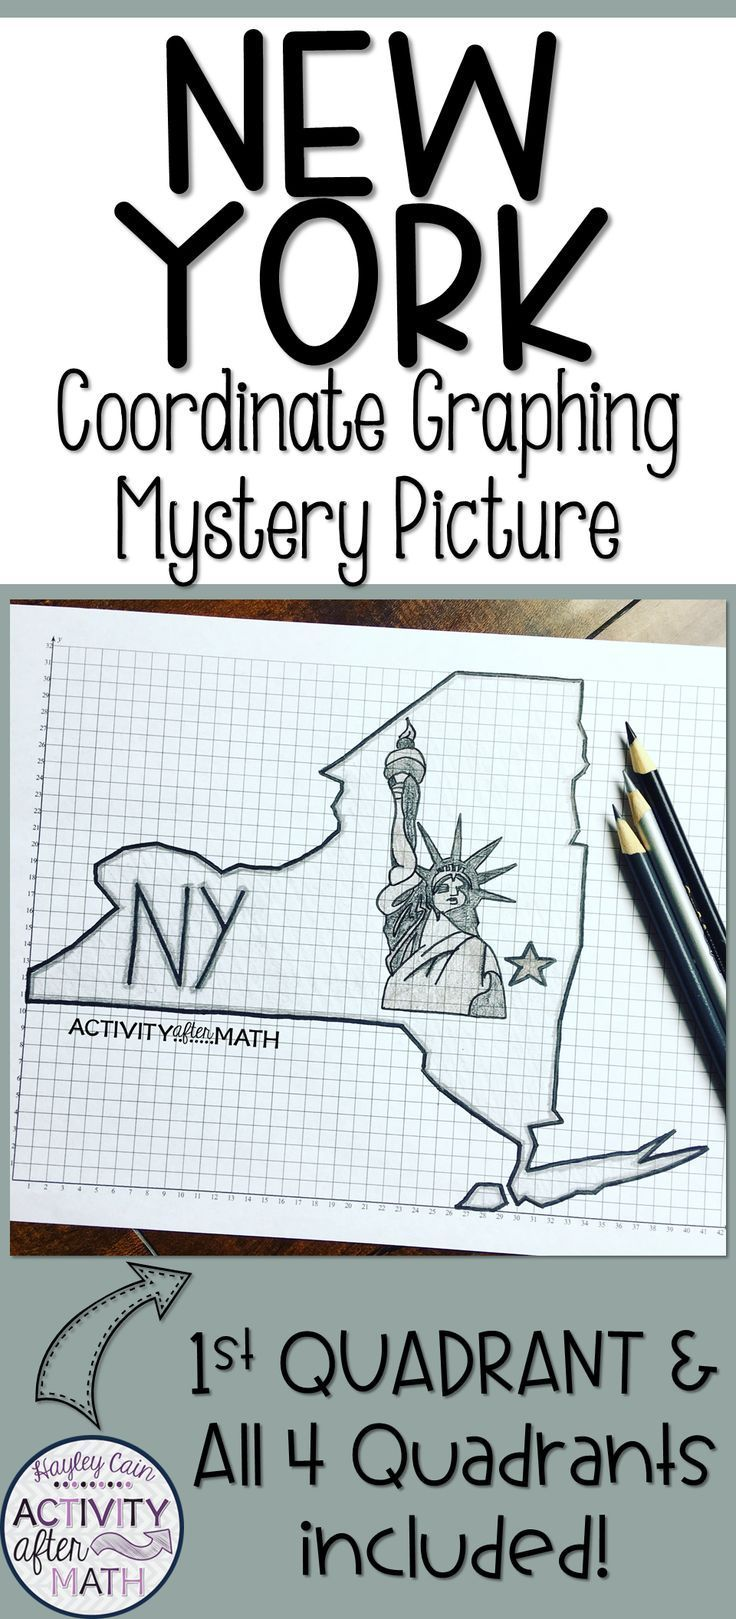 New York Coordinate Graphing Picture 1st Quadrant & ALL 4 Quadrants ...